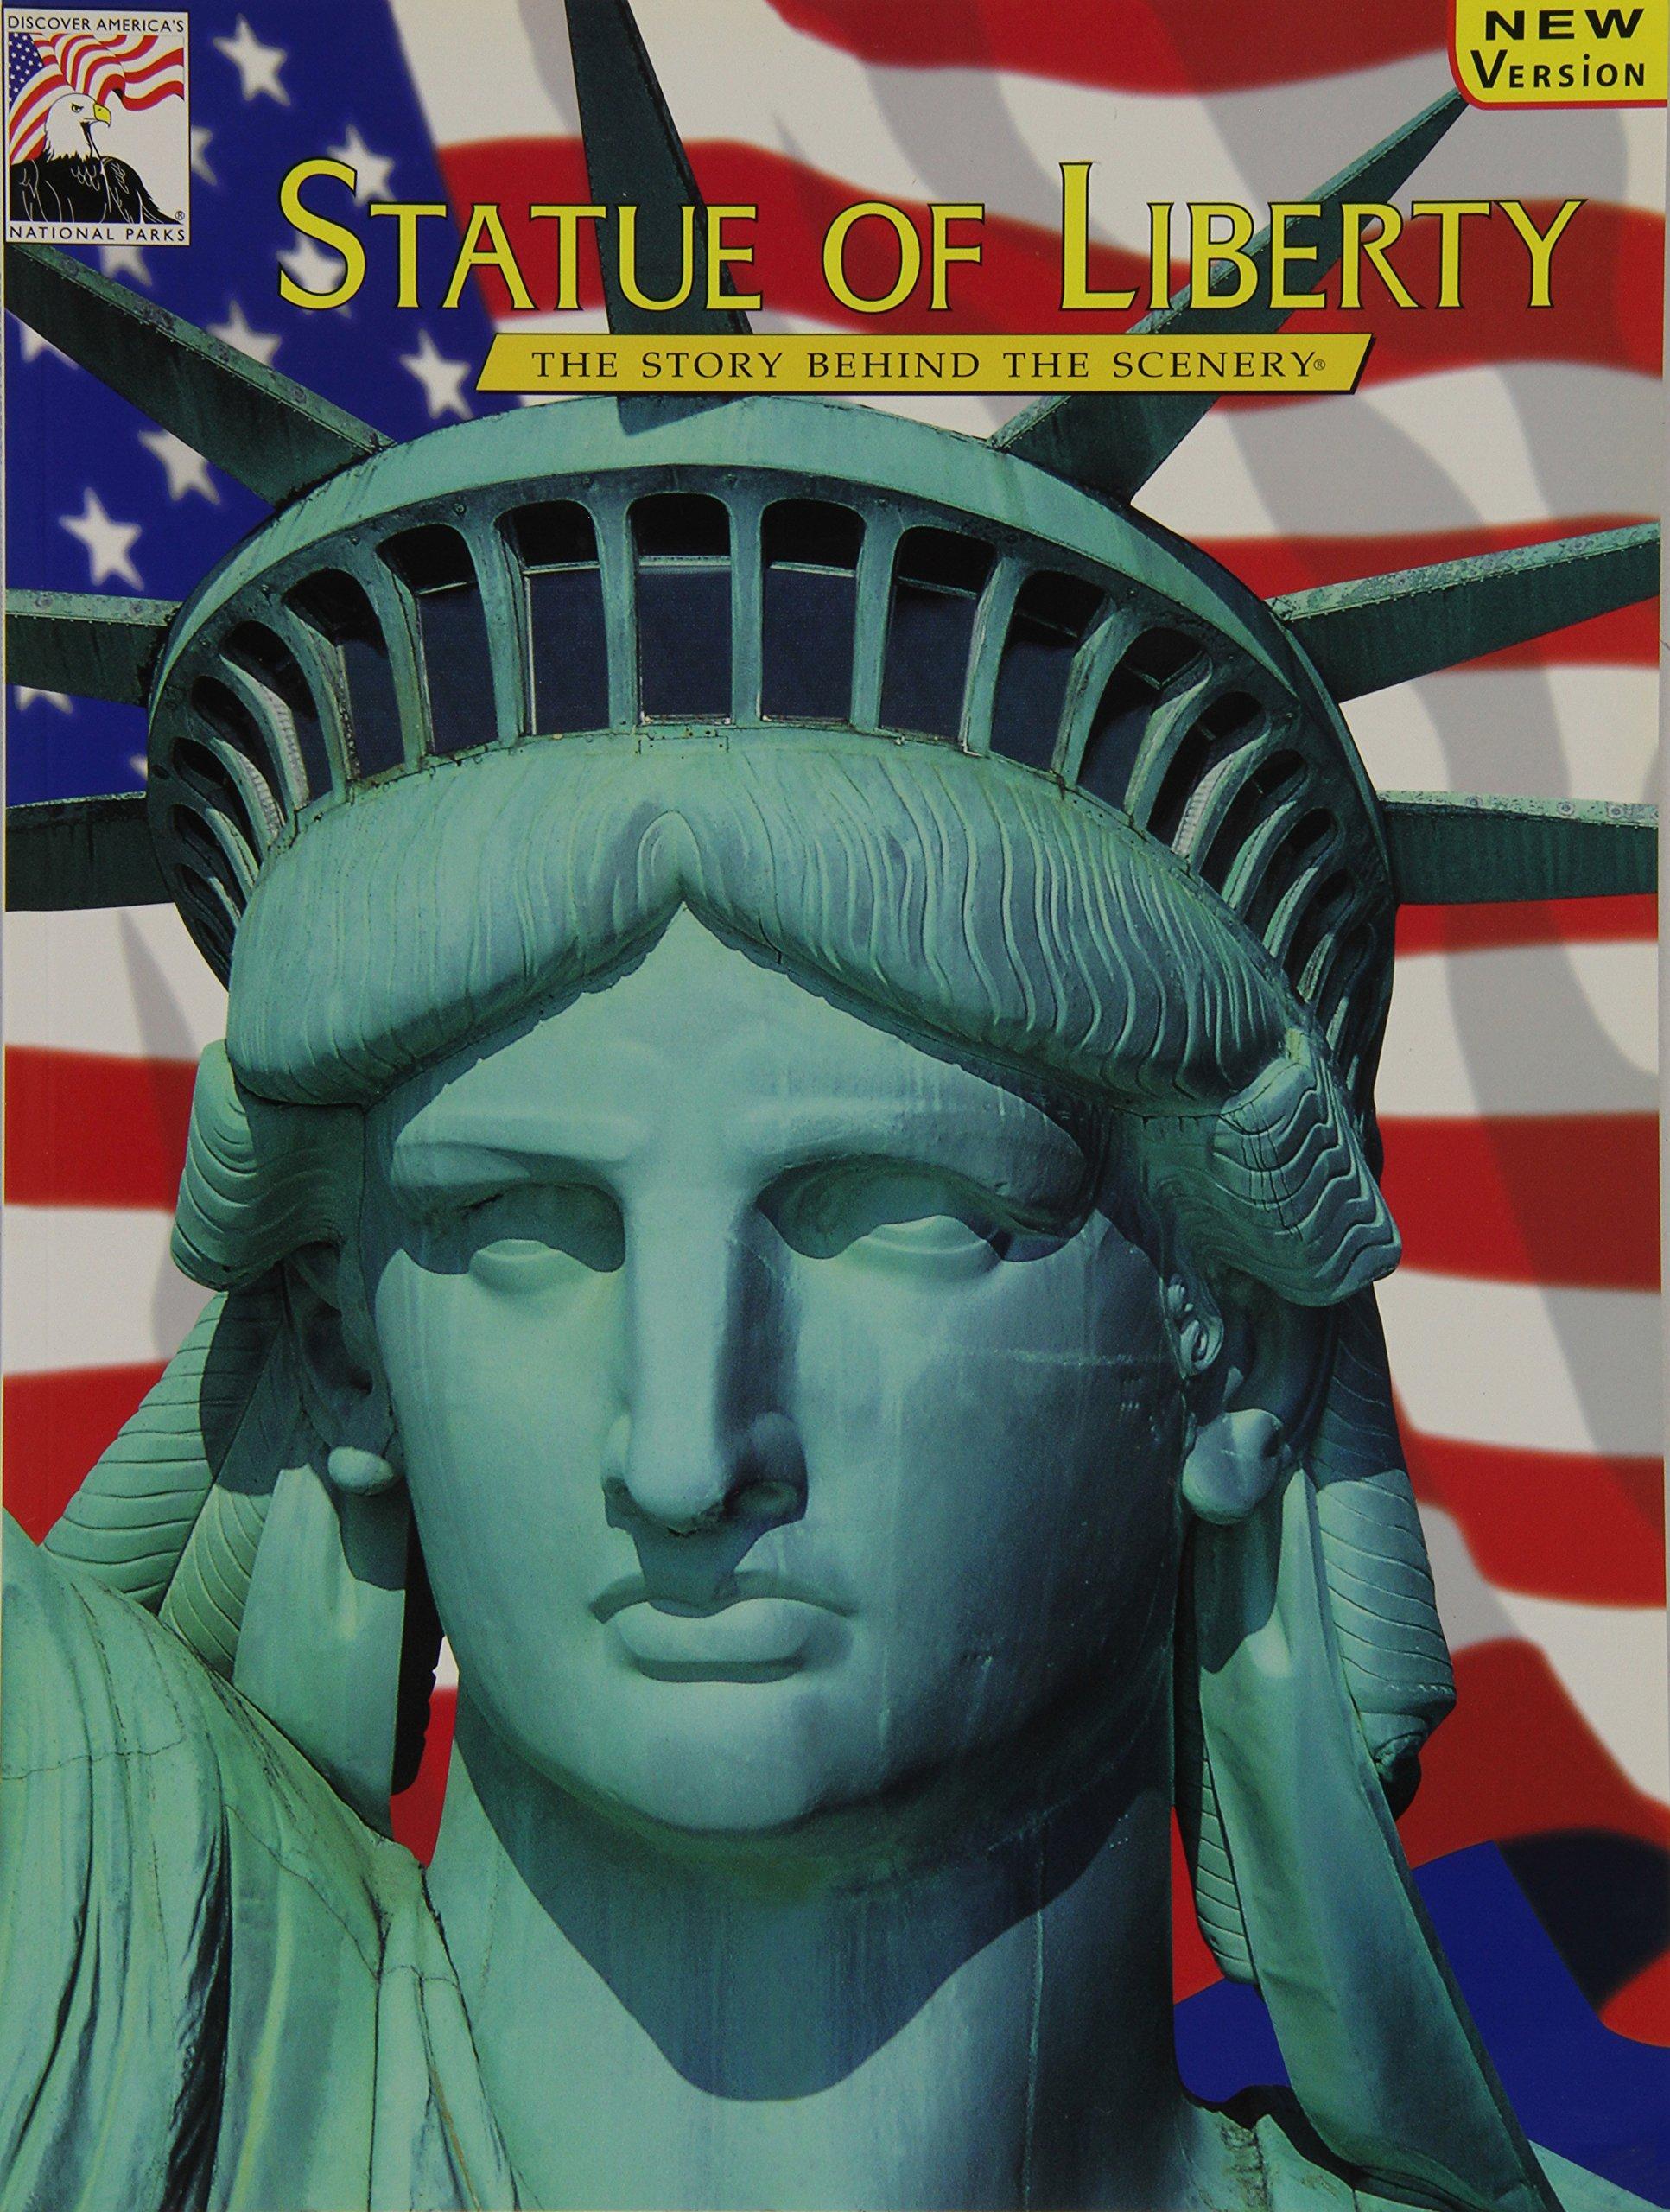 Statue Of Liberty The Story Behind The Scenery Paul Weinbaum K C Den Dooven 9780887140235 Amazon Com Books